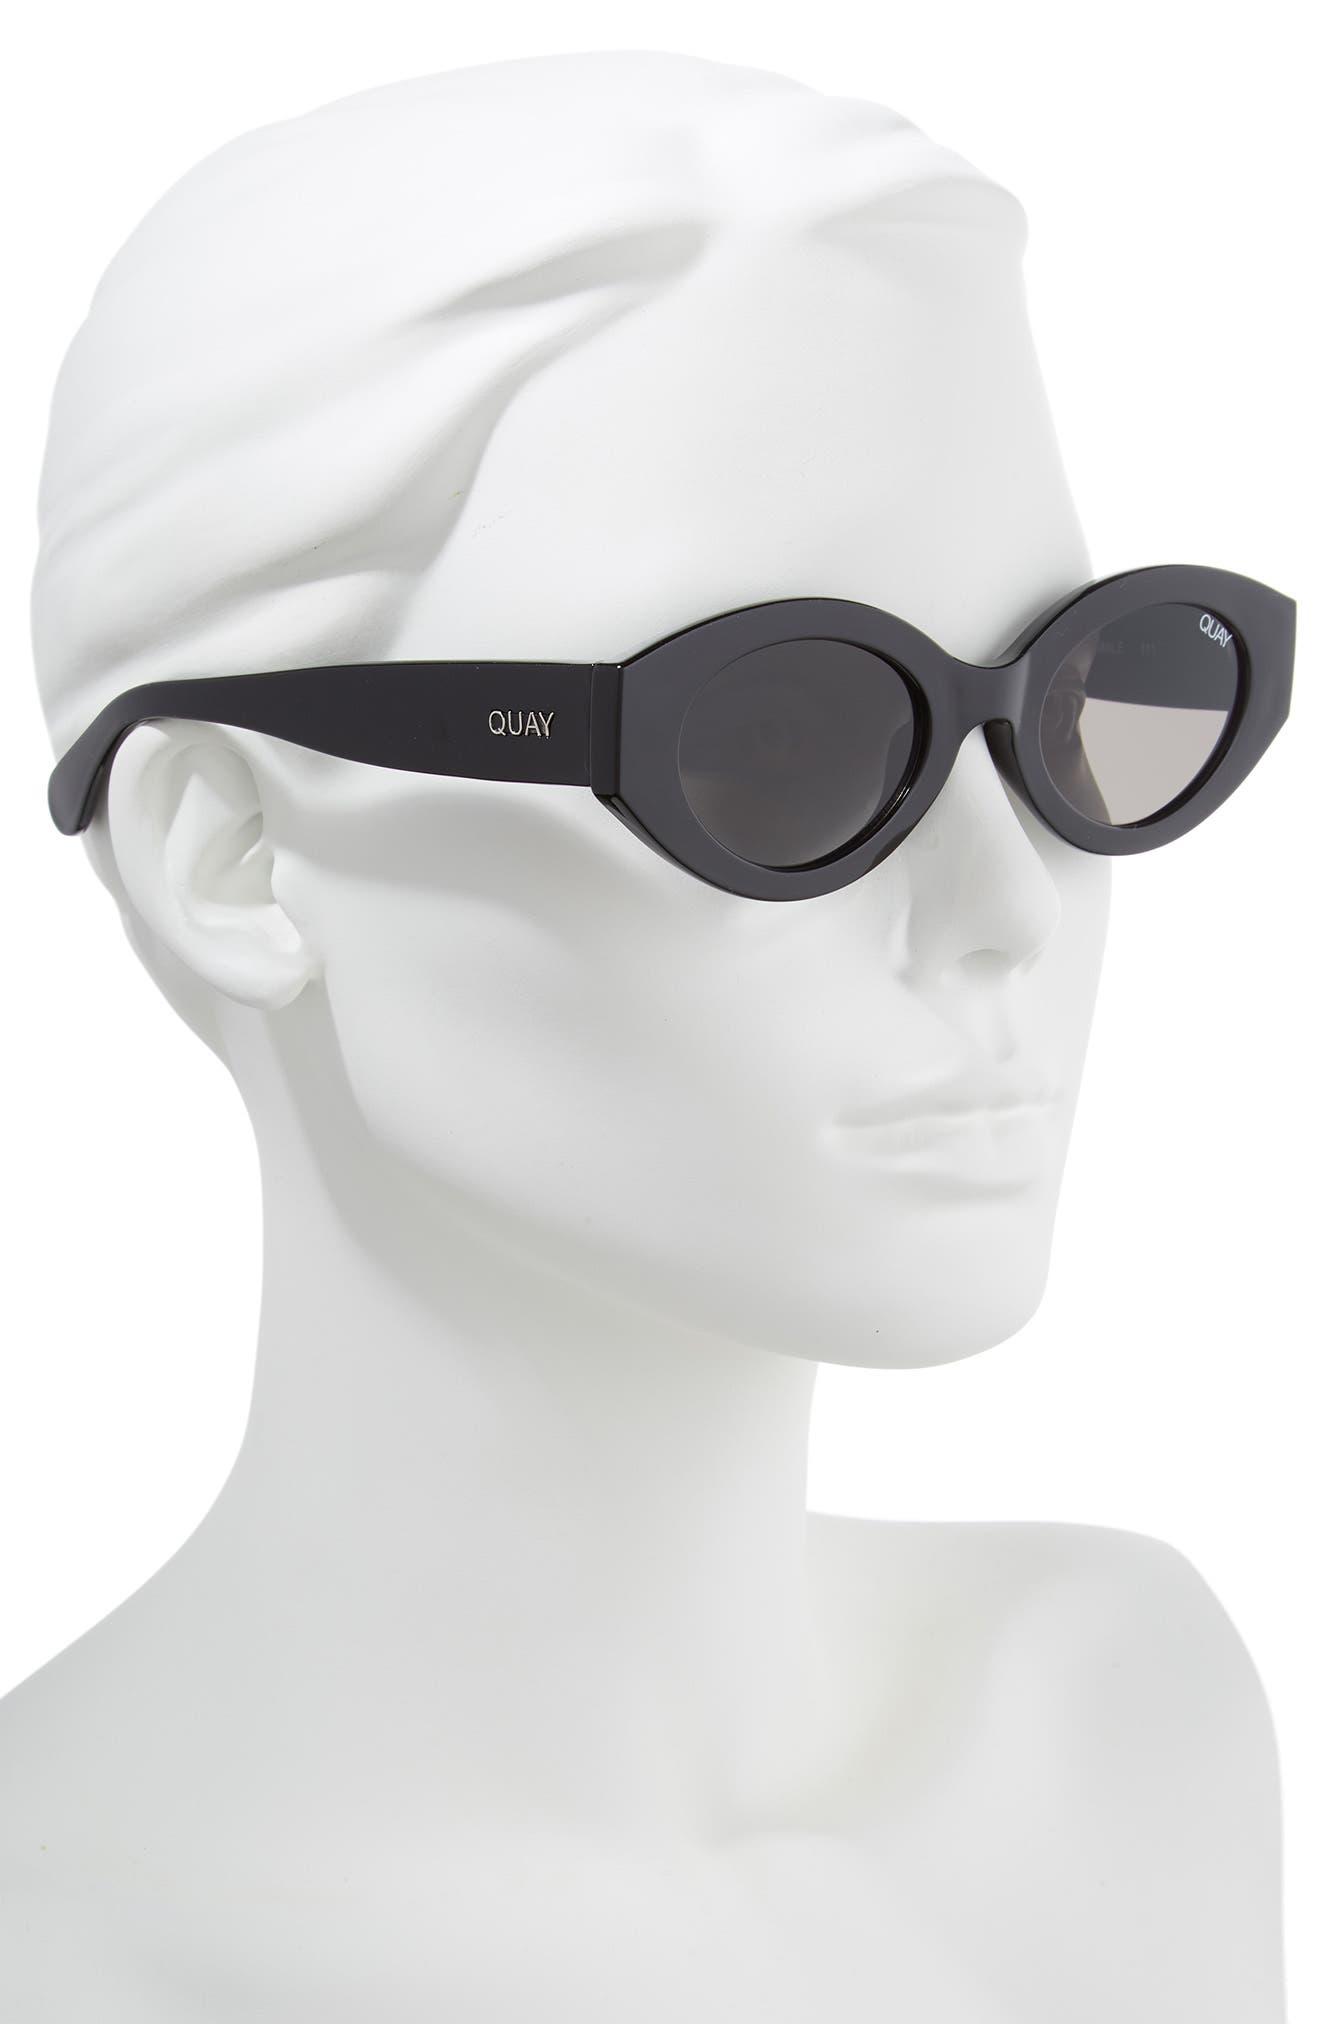 See Me Smile 50mm Cat Eye Sunglasses,                             Alternate thumbnail 3, color,                             Black/ Smoke